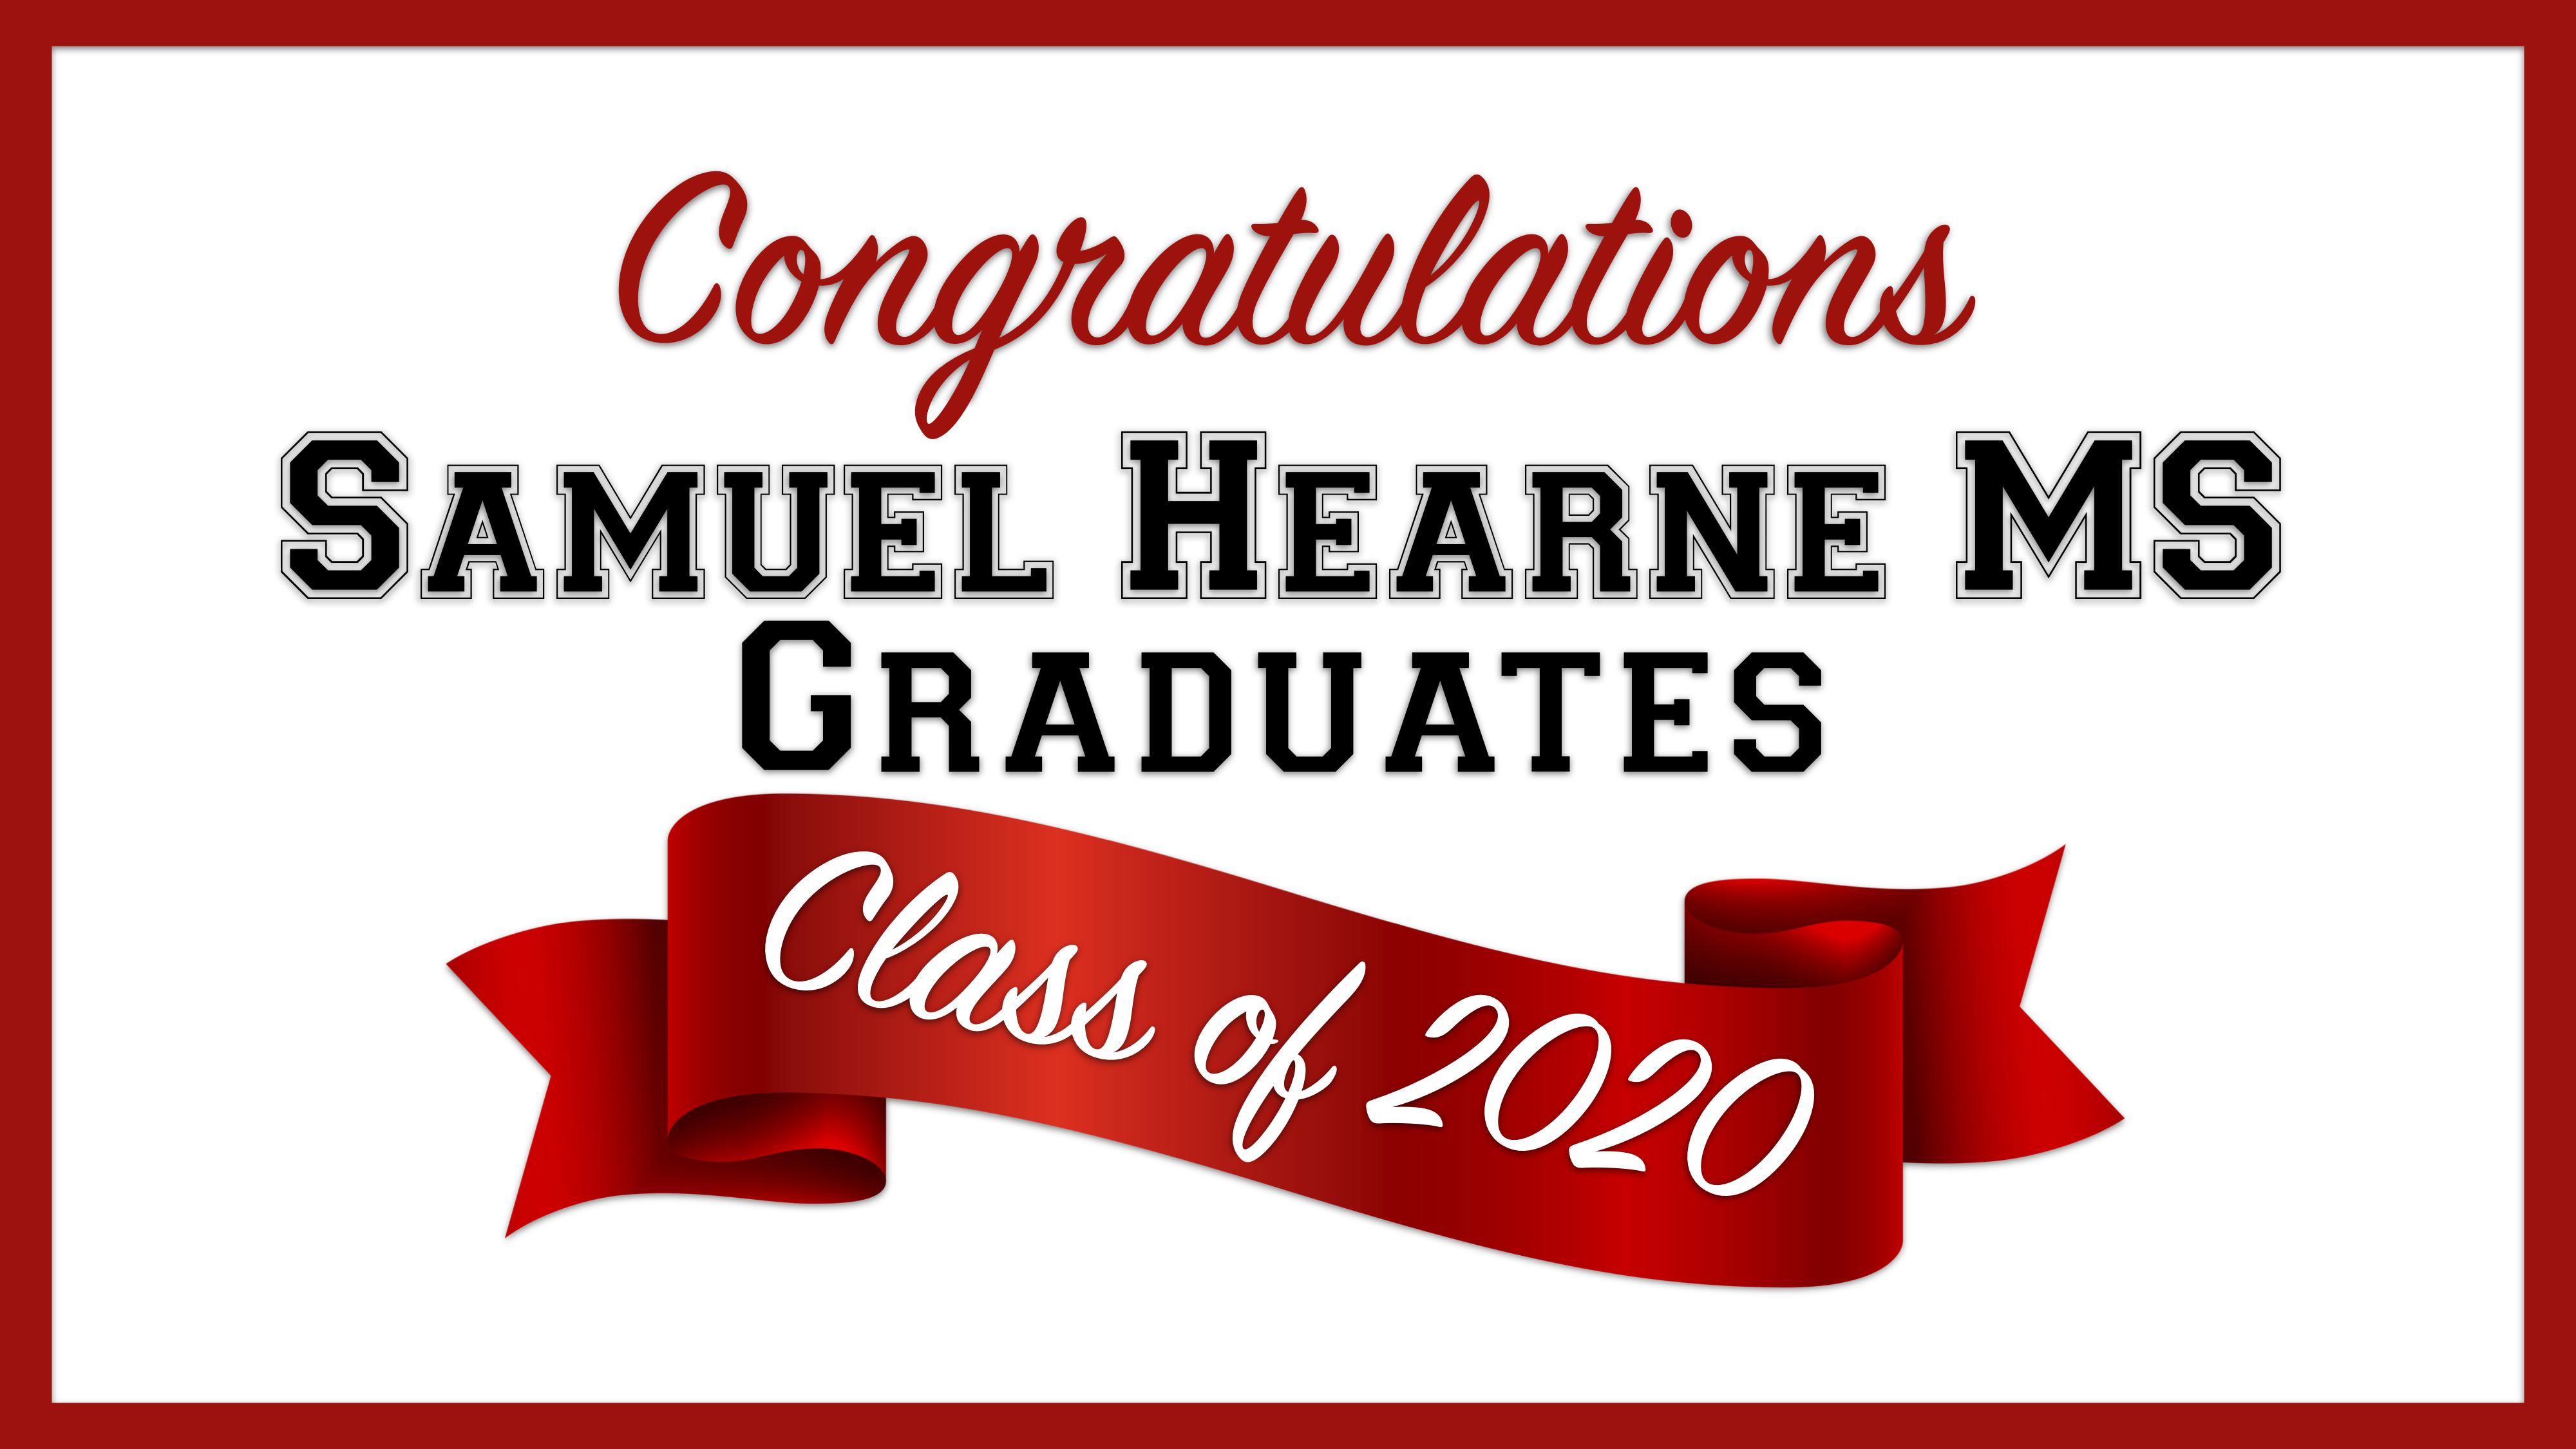 Samuel Hearne MS - Class of 2020 - Grade 8 Graduation Sign